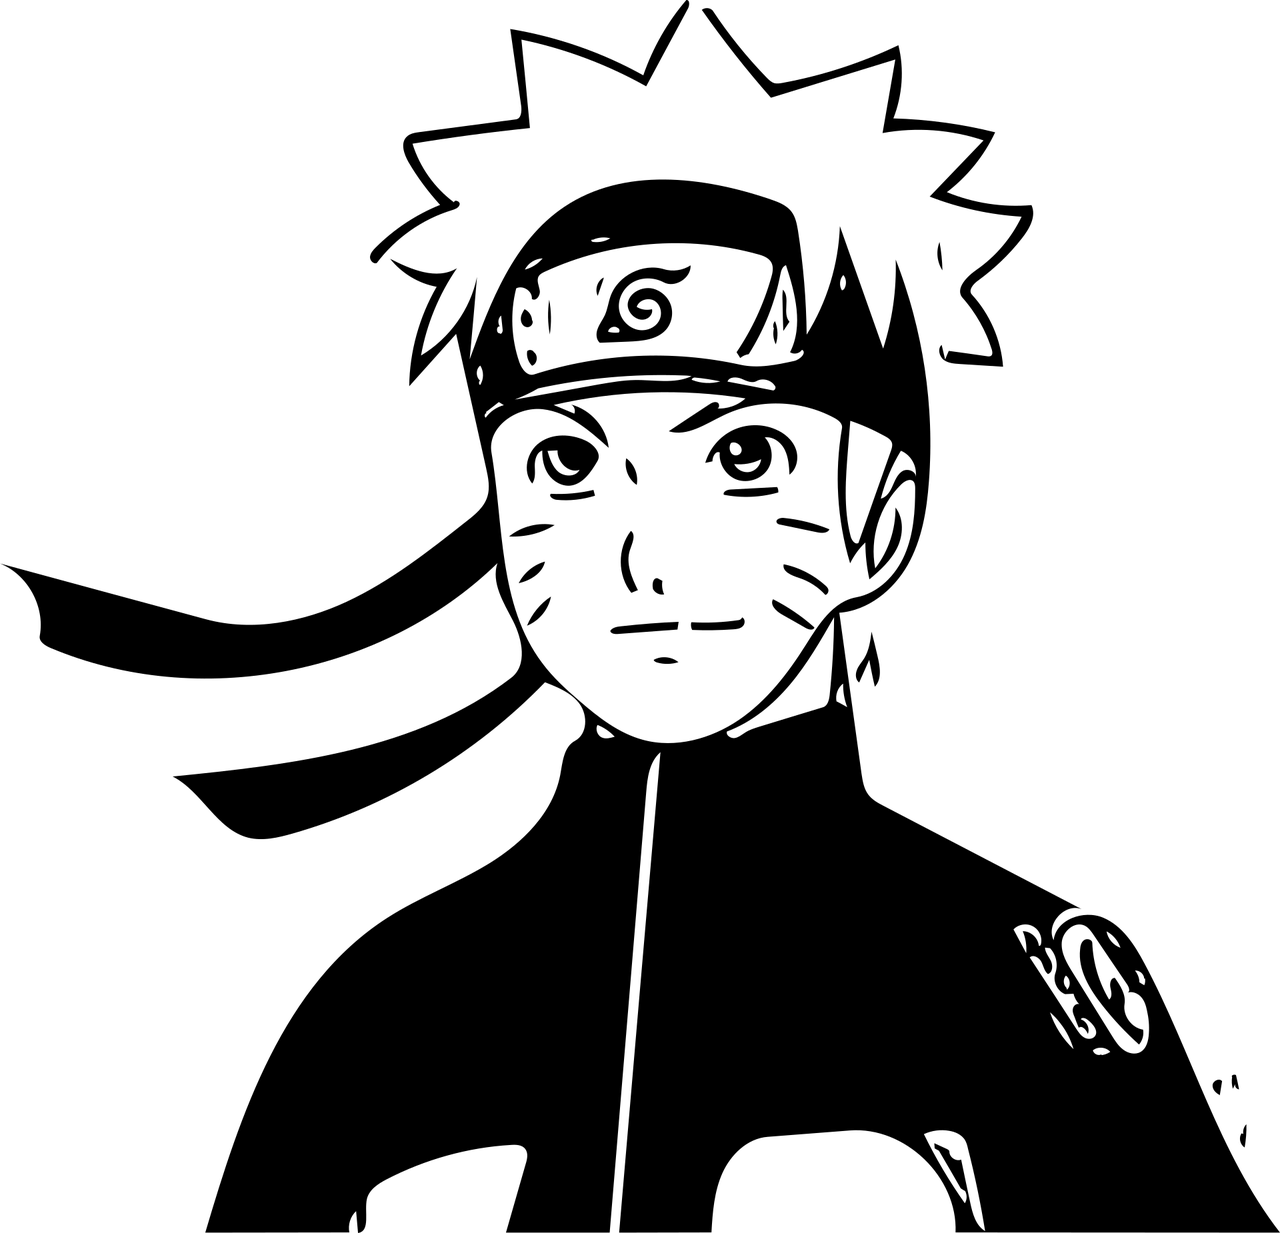 Naruto Anime Japanese Free Vector Graphic On Pixabay